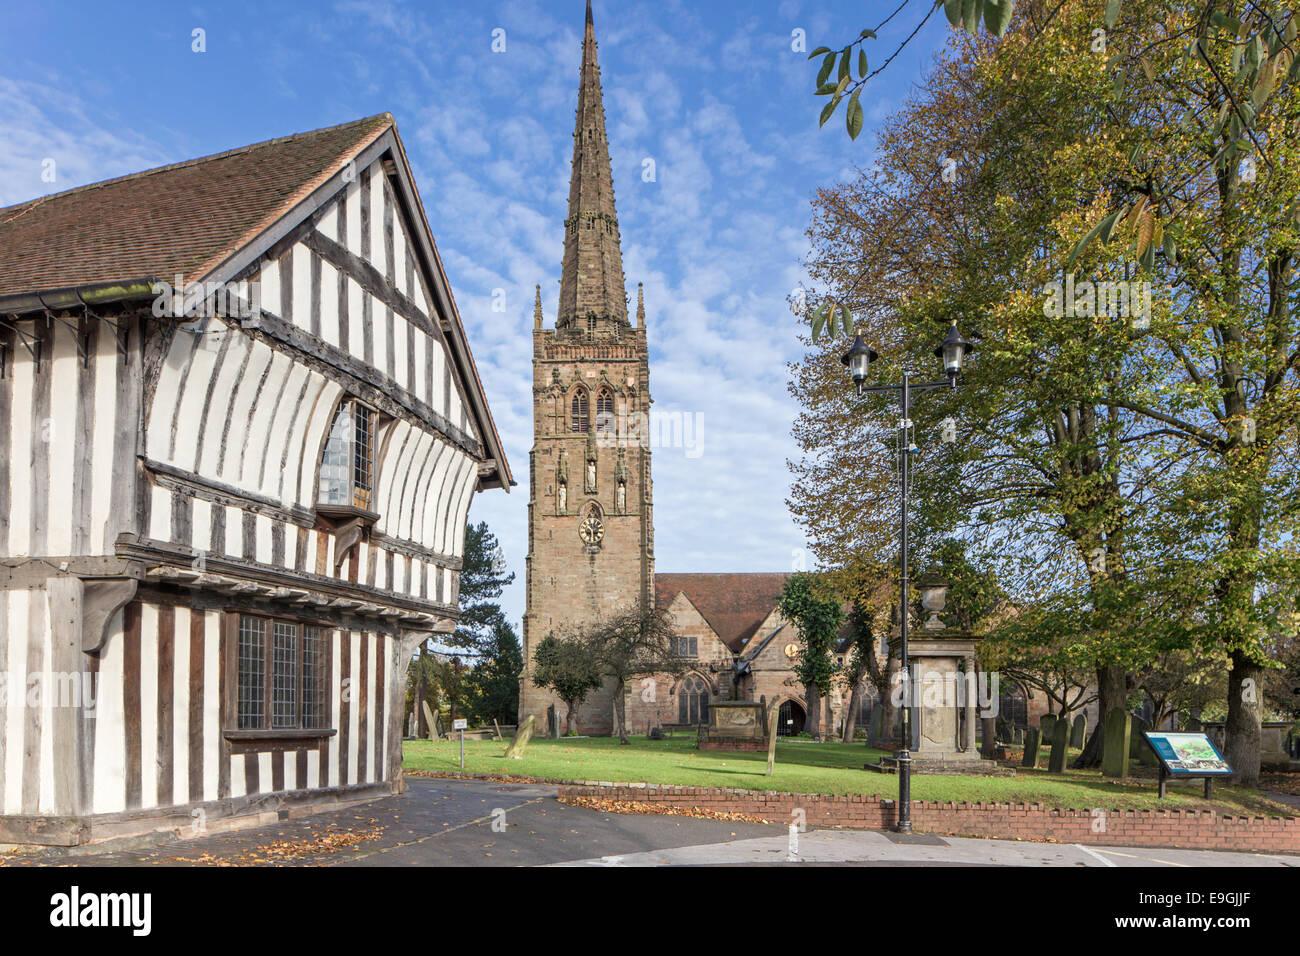 The15th century timber framed Tudor Merchants House and St Nicolas Church, Kings Norton, Birmingham, West Midlands, - Stock Image